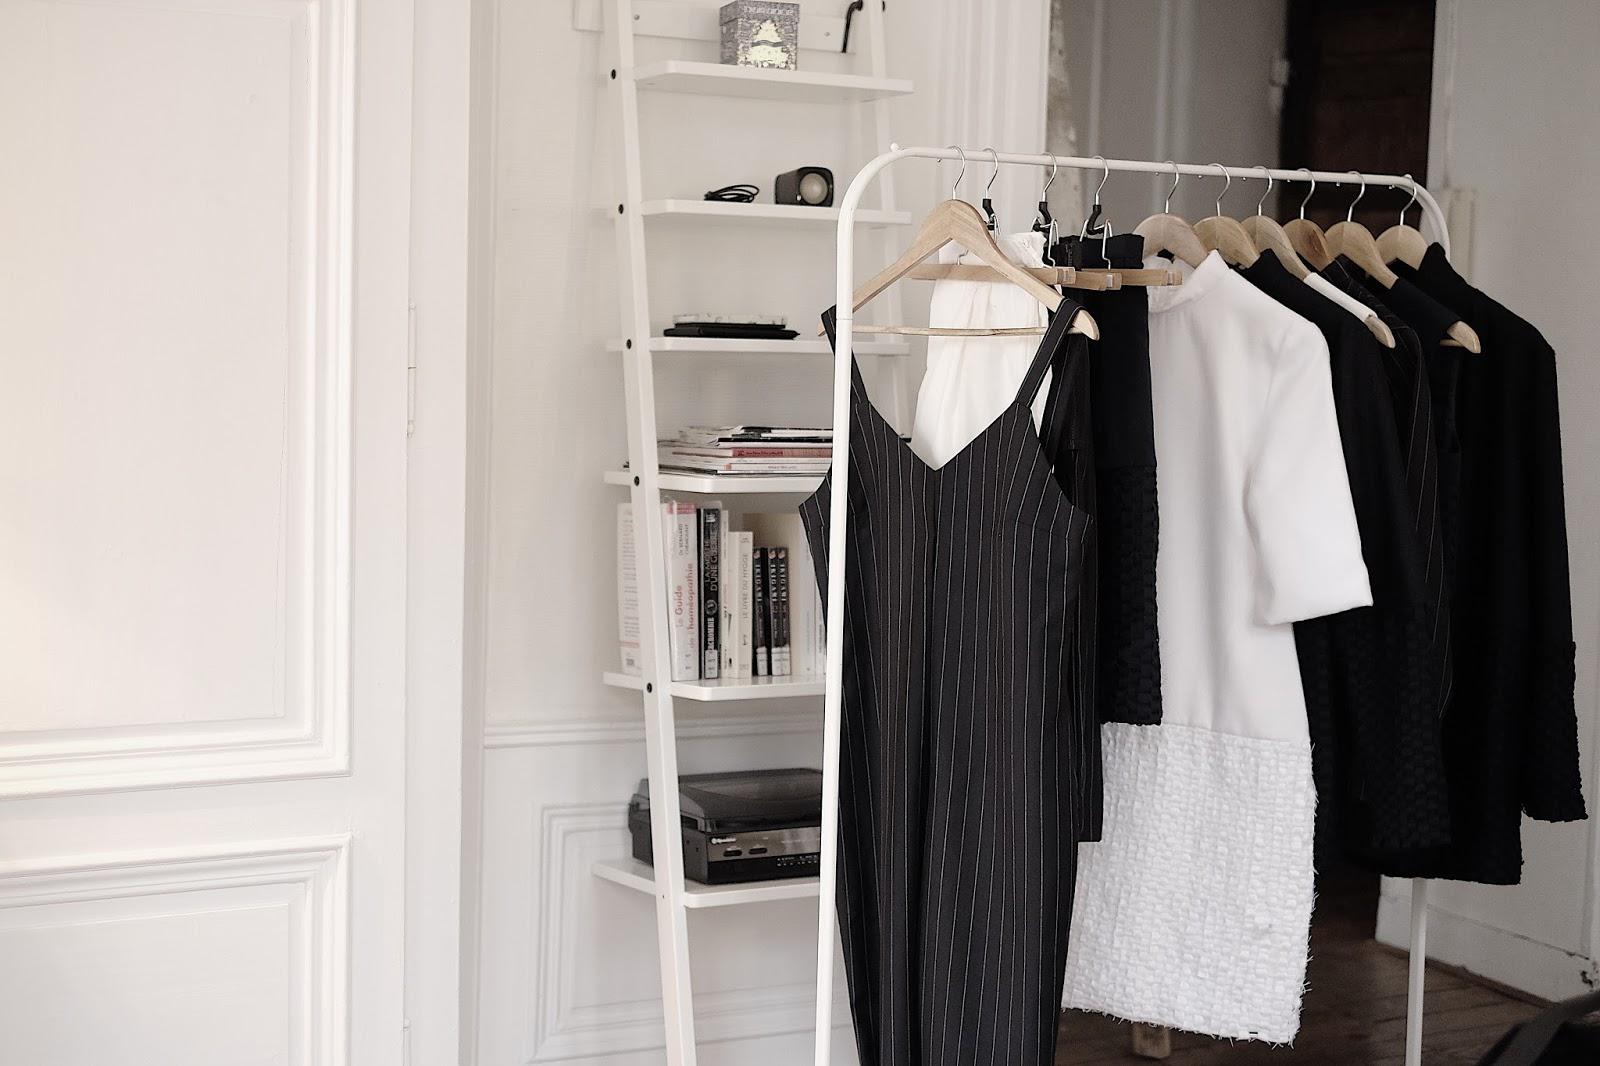 blog mode, blogueuse mode, blog mode lyon, ameni daily, mathilde clothes, amenidaily, blogueuse lyonnaise, blouse virgil, parisian style, parisienne, blogueuse parisienne